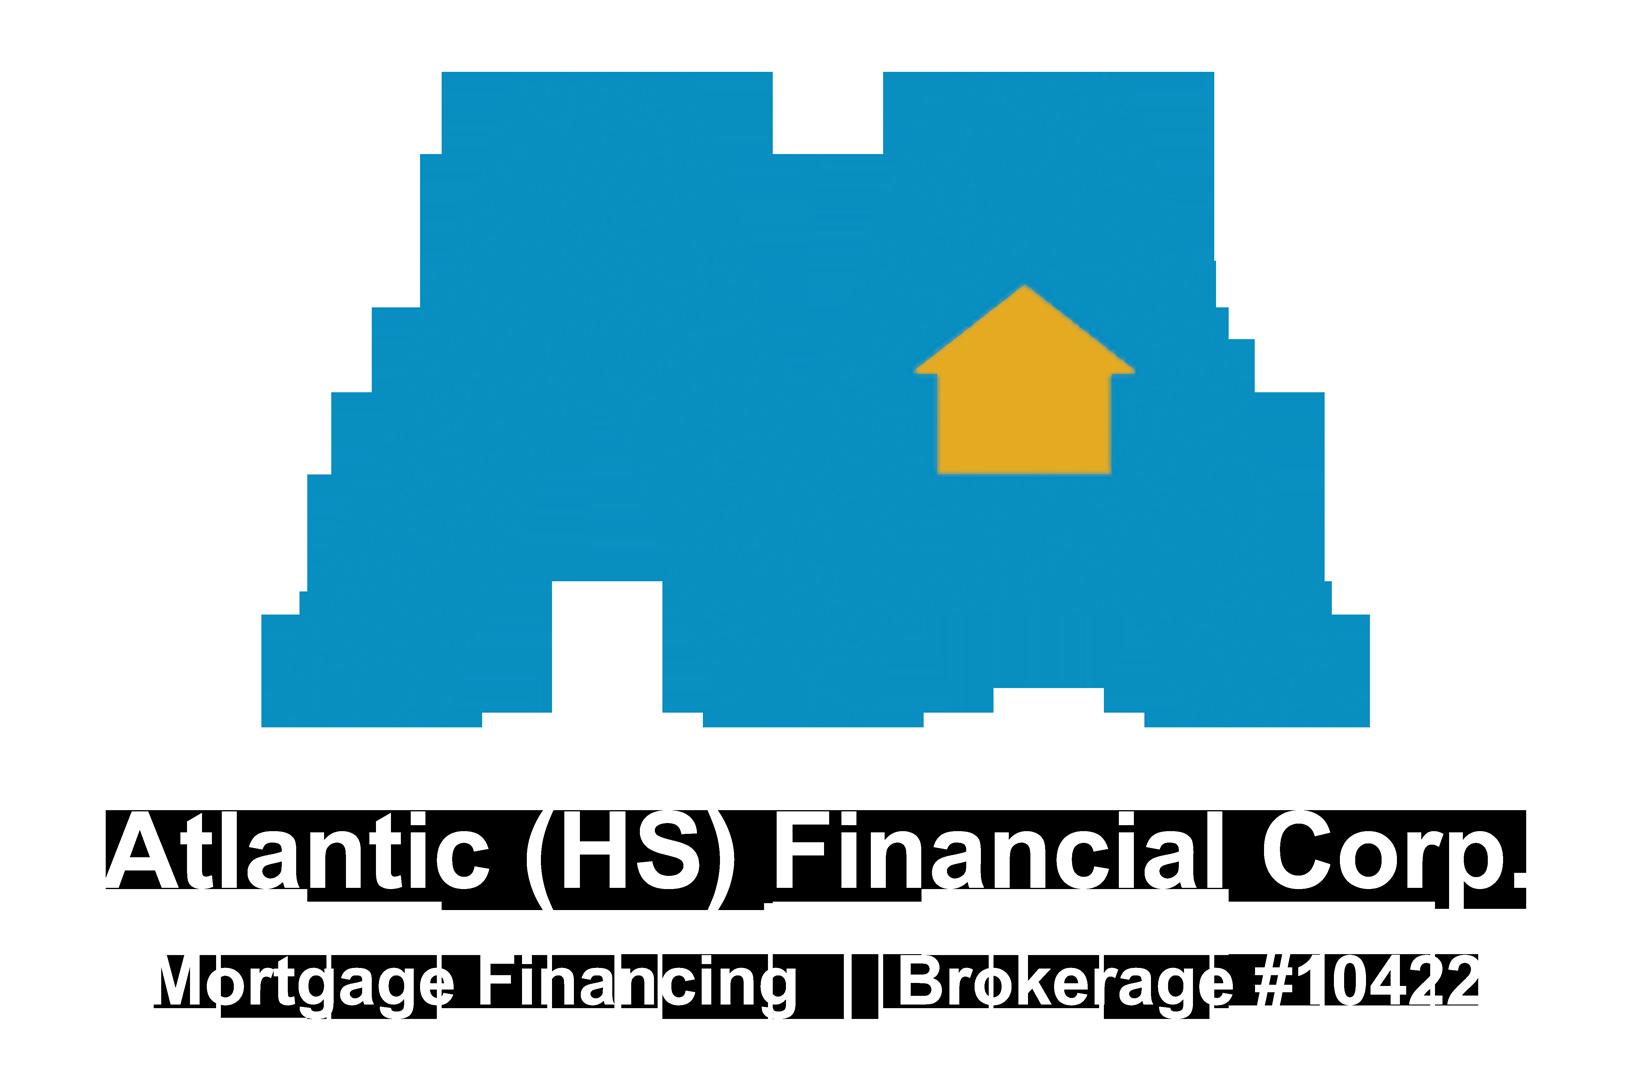 Atlantic (HS) Financial Corp.